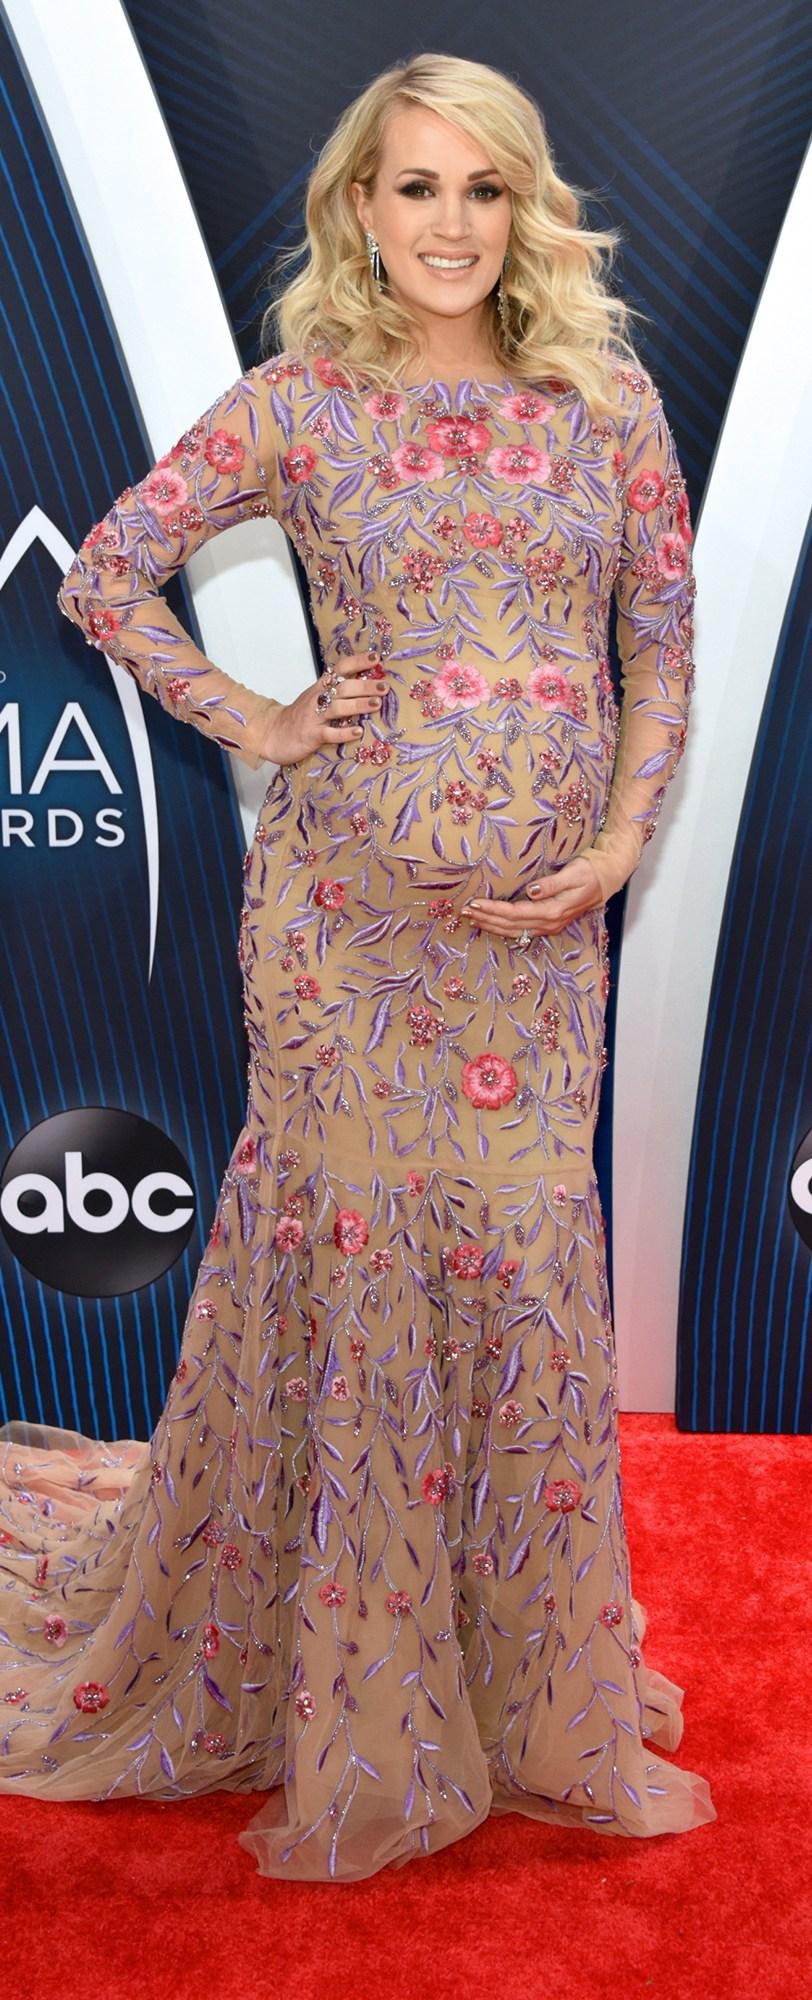 Carrie-Underwood-CMA-Awards-18